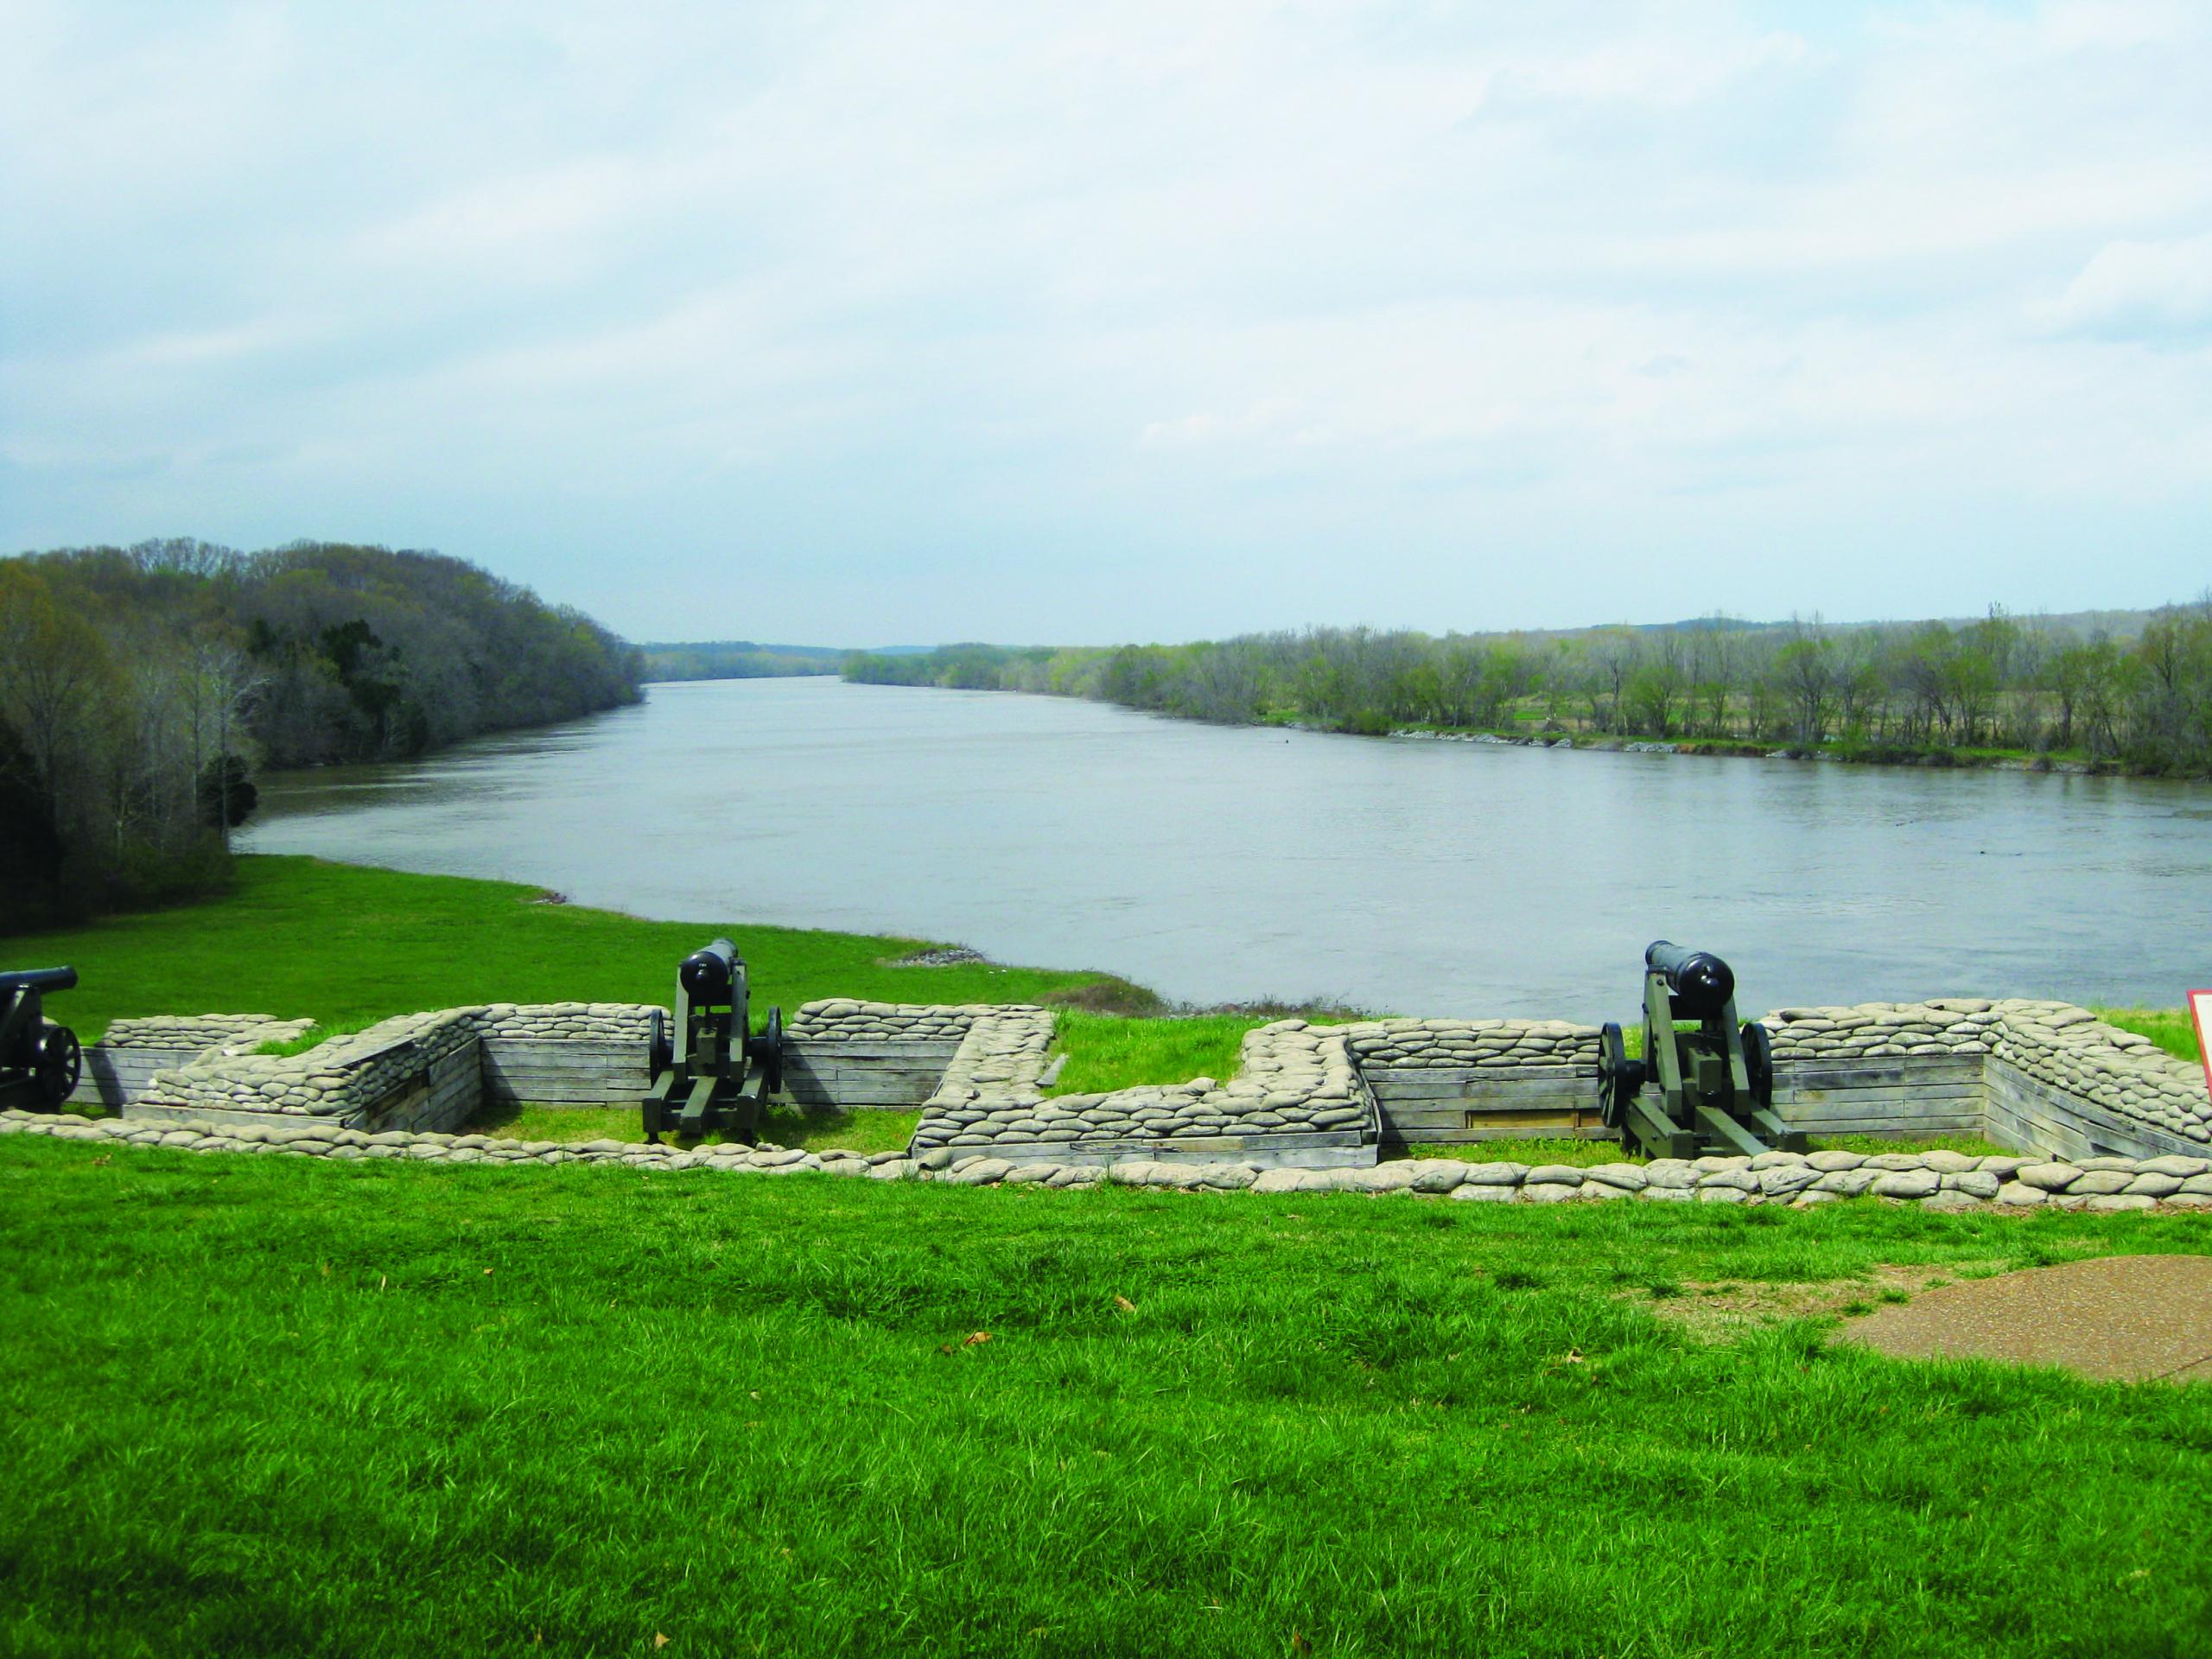 Fort Donelson National Battlefield